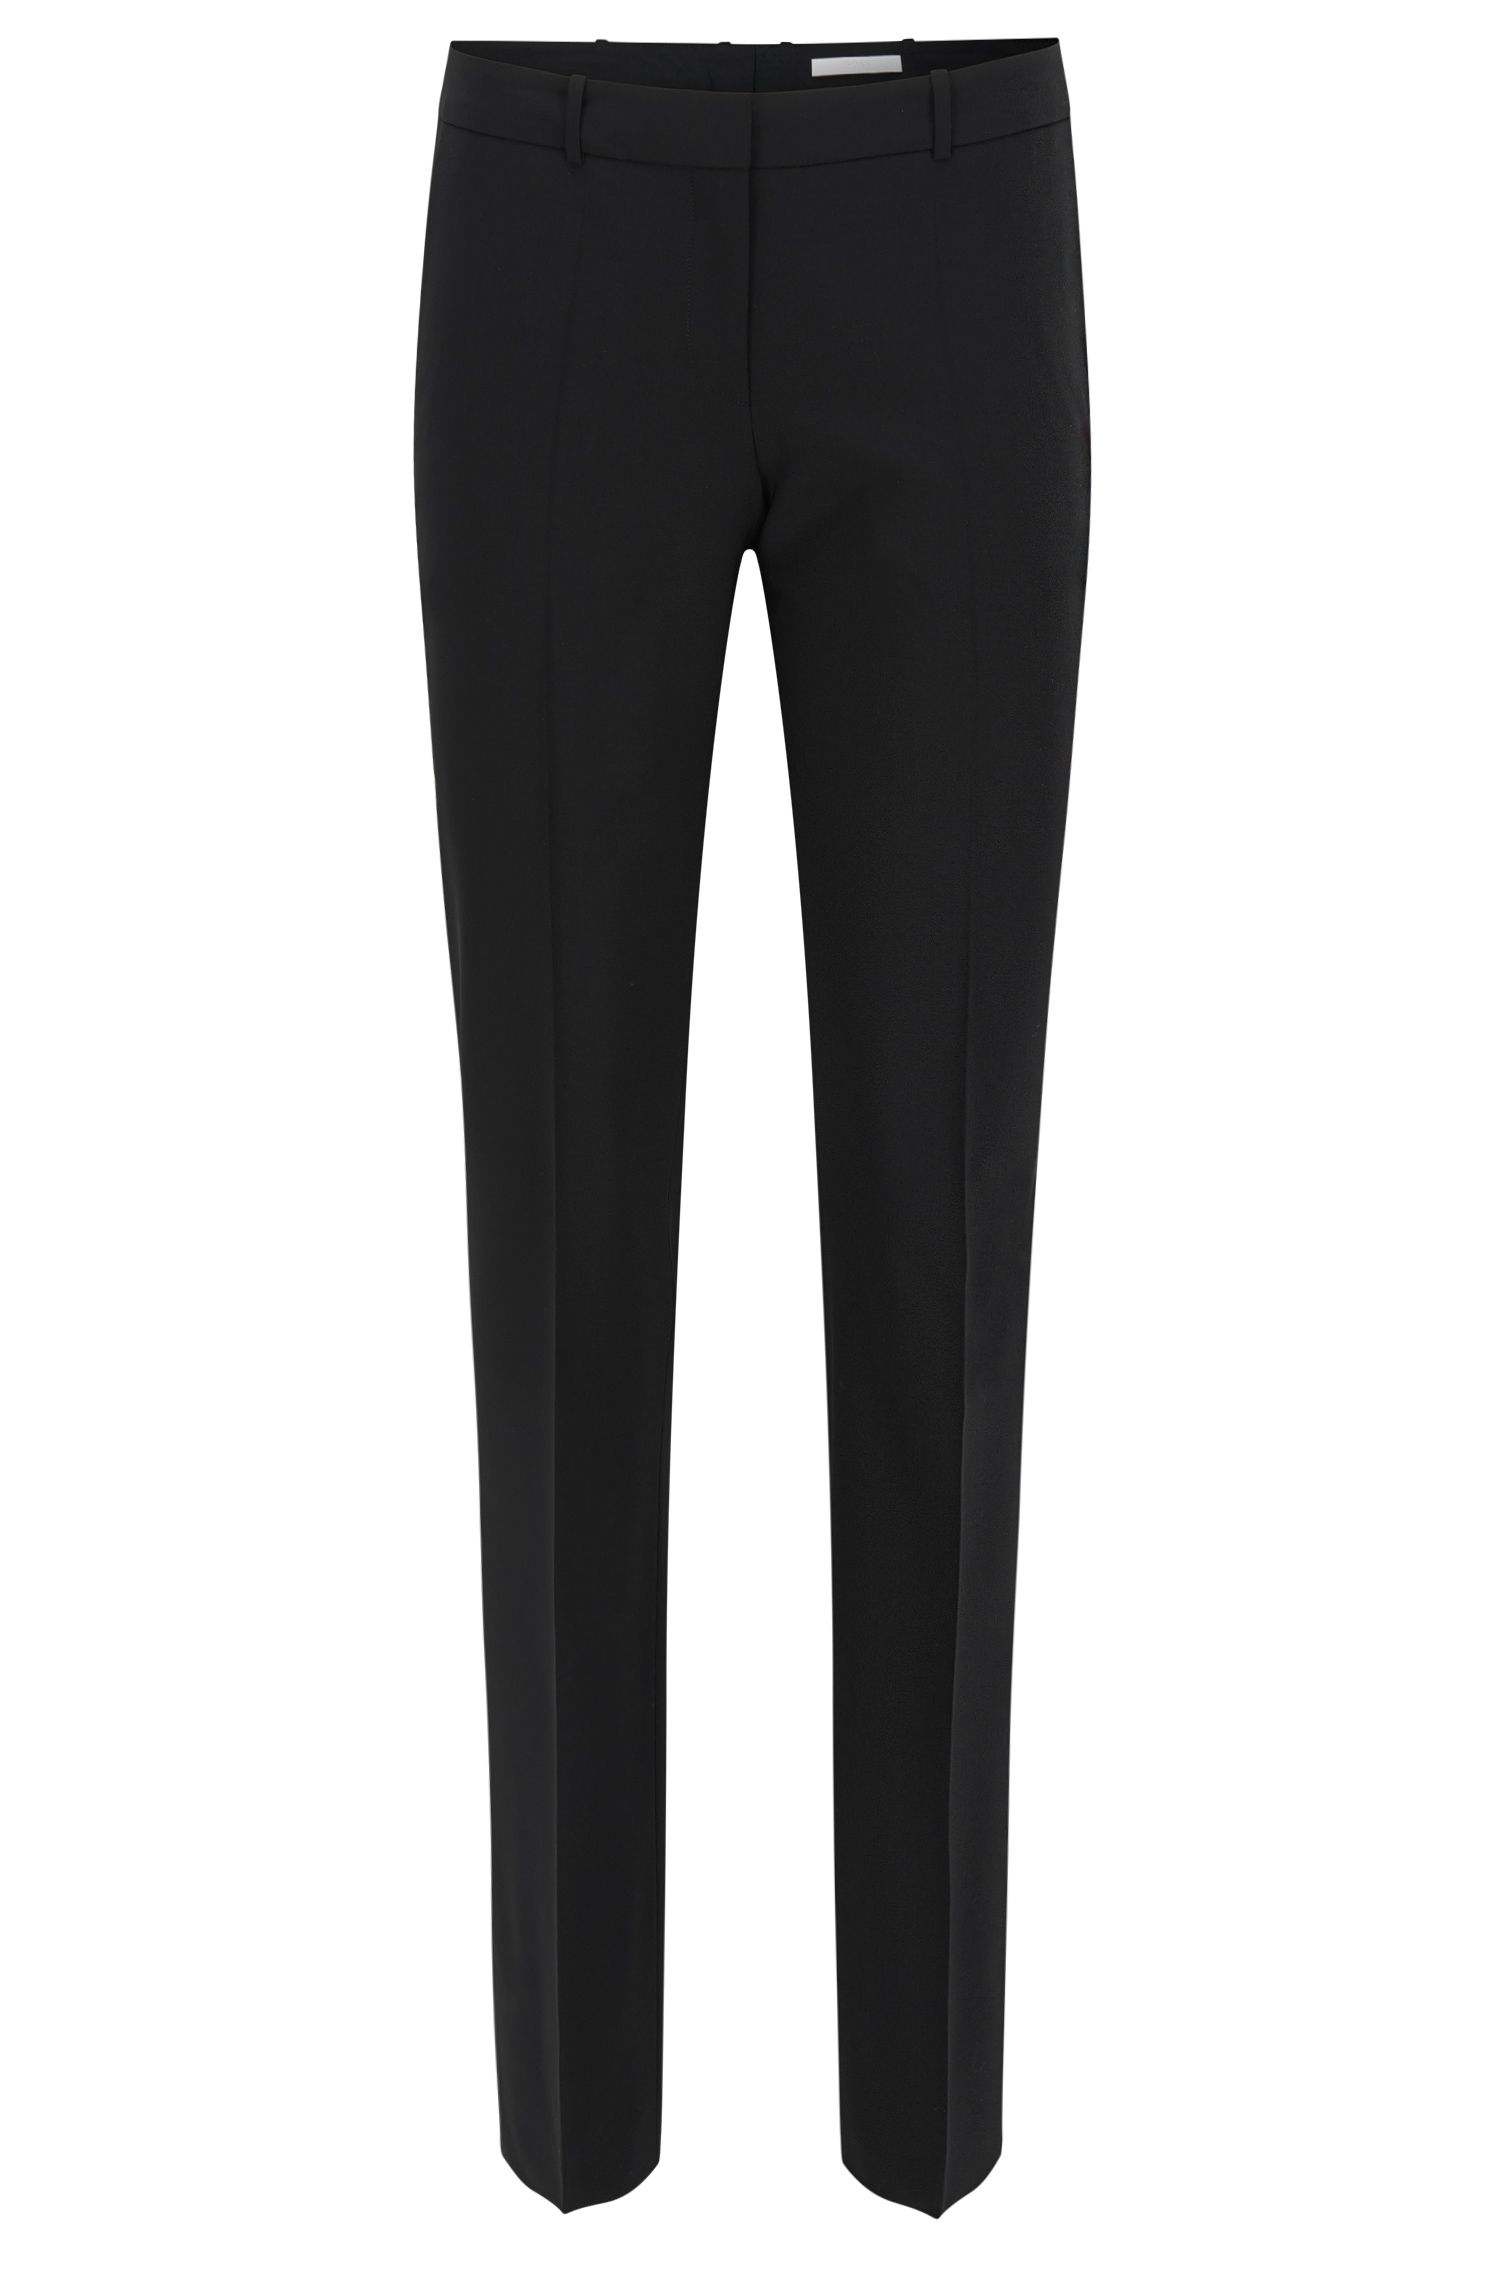 Pantaloni business straight cut in lana elasticizzata